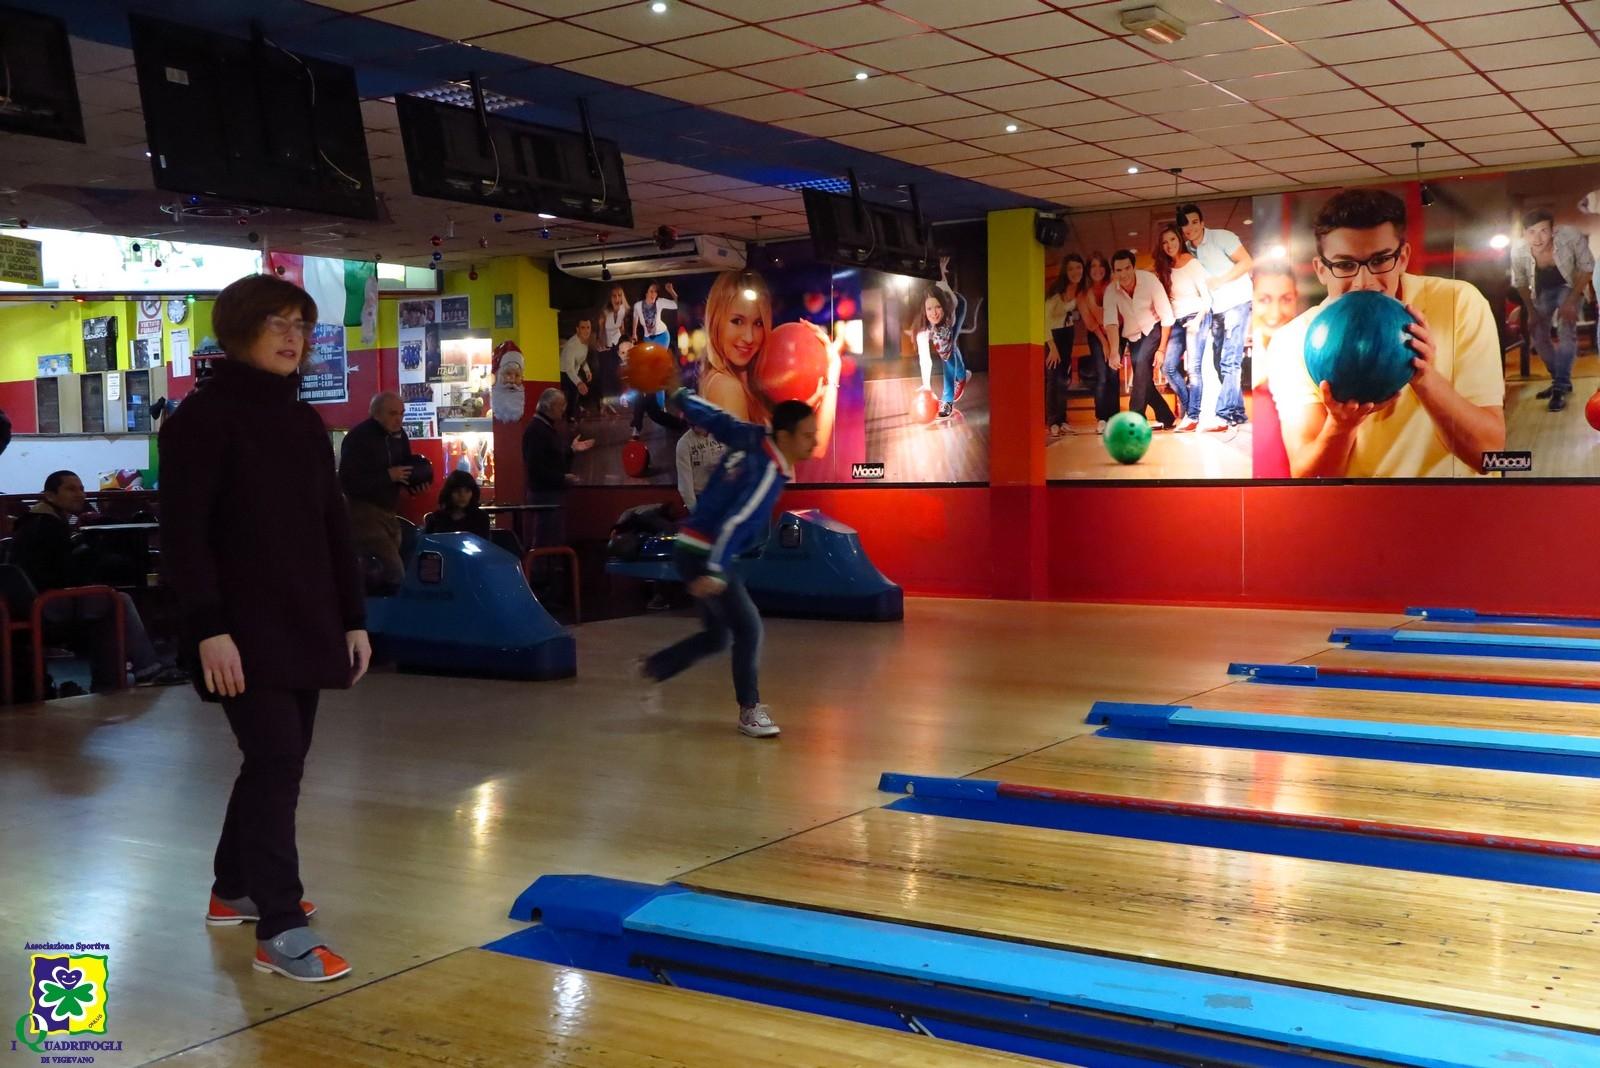 Torneo Bowling Vigevano 19-12-2018 - 064